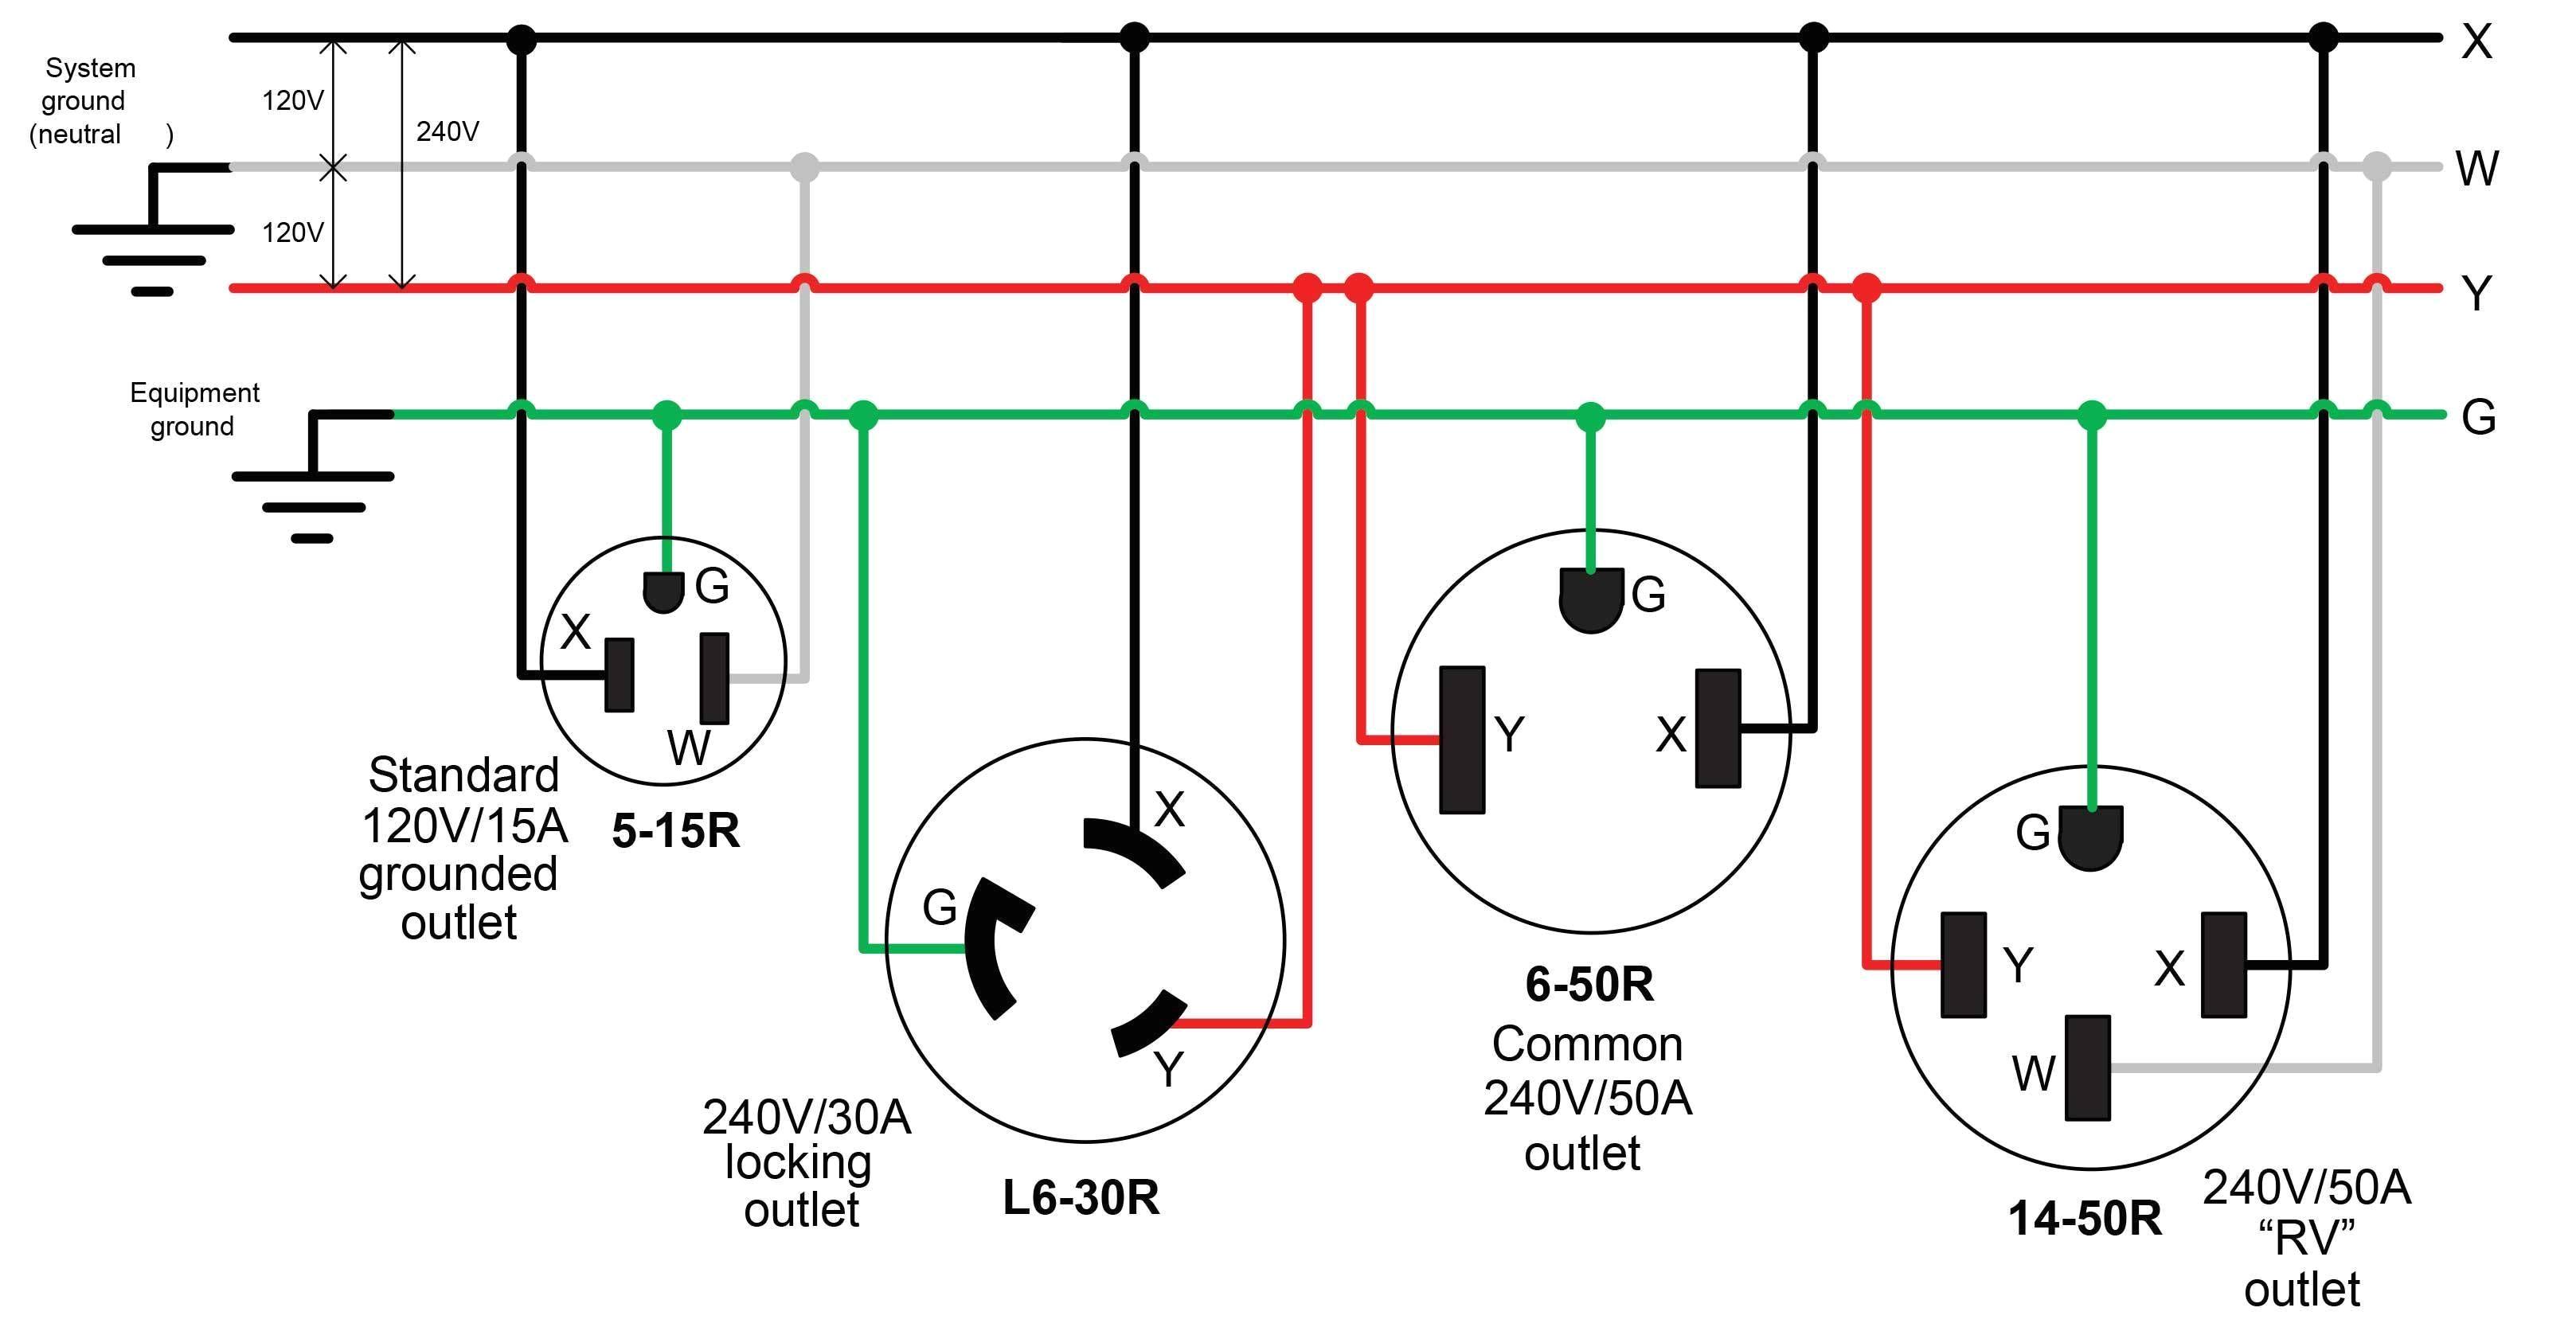 wiring diagram 30 amp plug wiring diagram schematic wiring diagram 220 volt 30 amp outlet mis wiring a 120 volt rv outlet